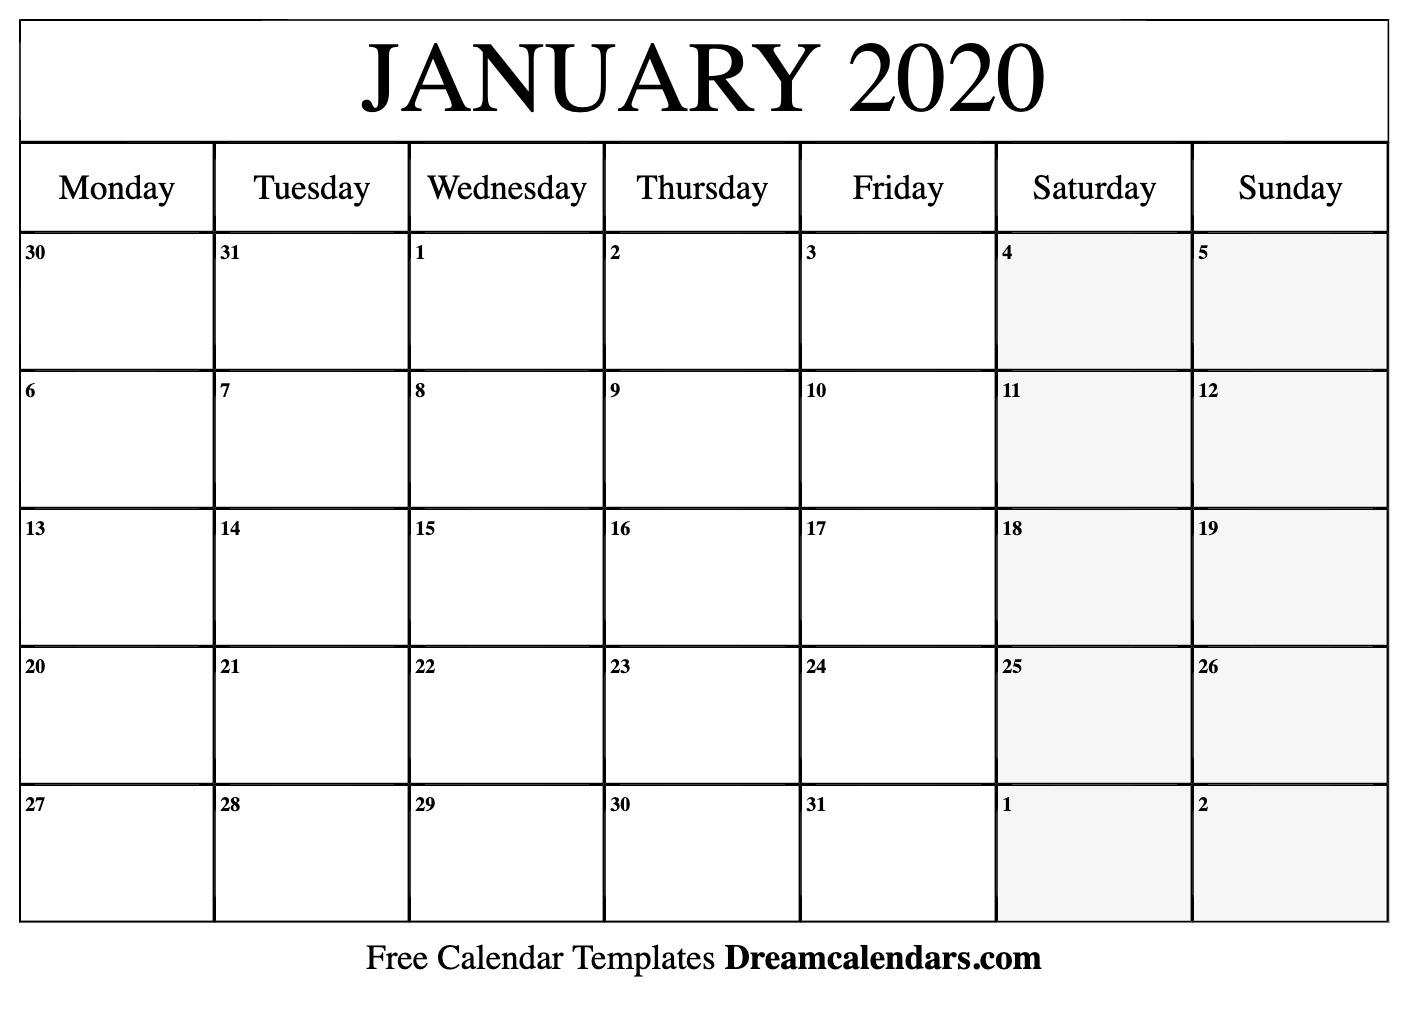 Dream Calendars